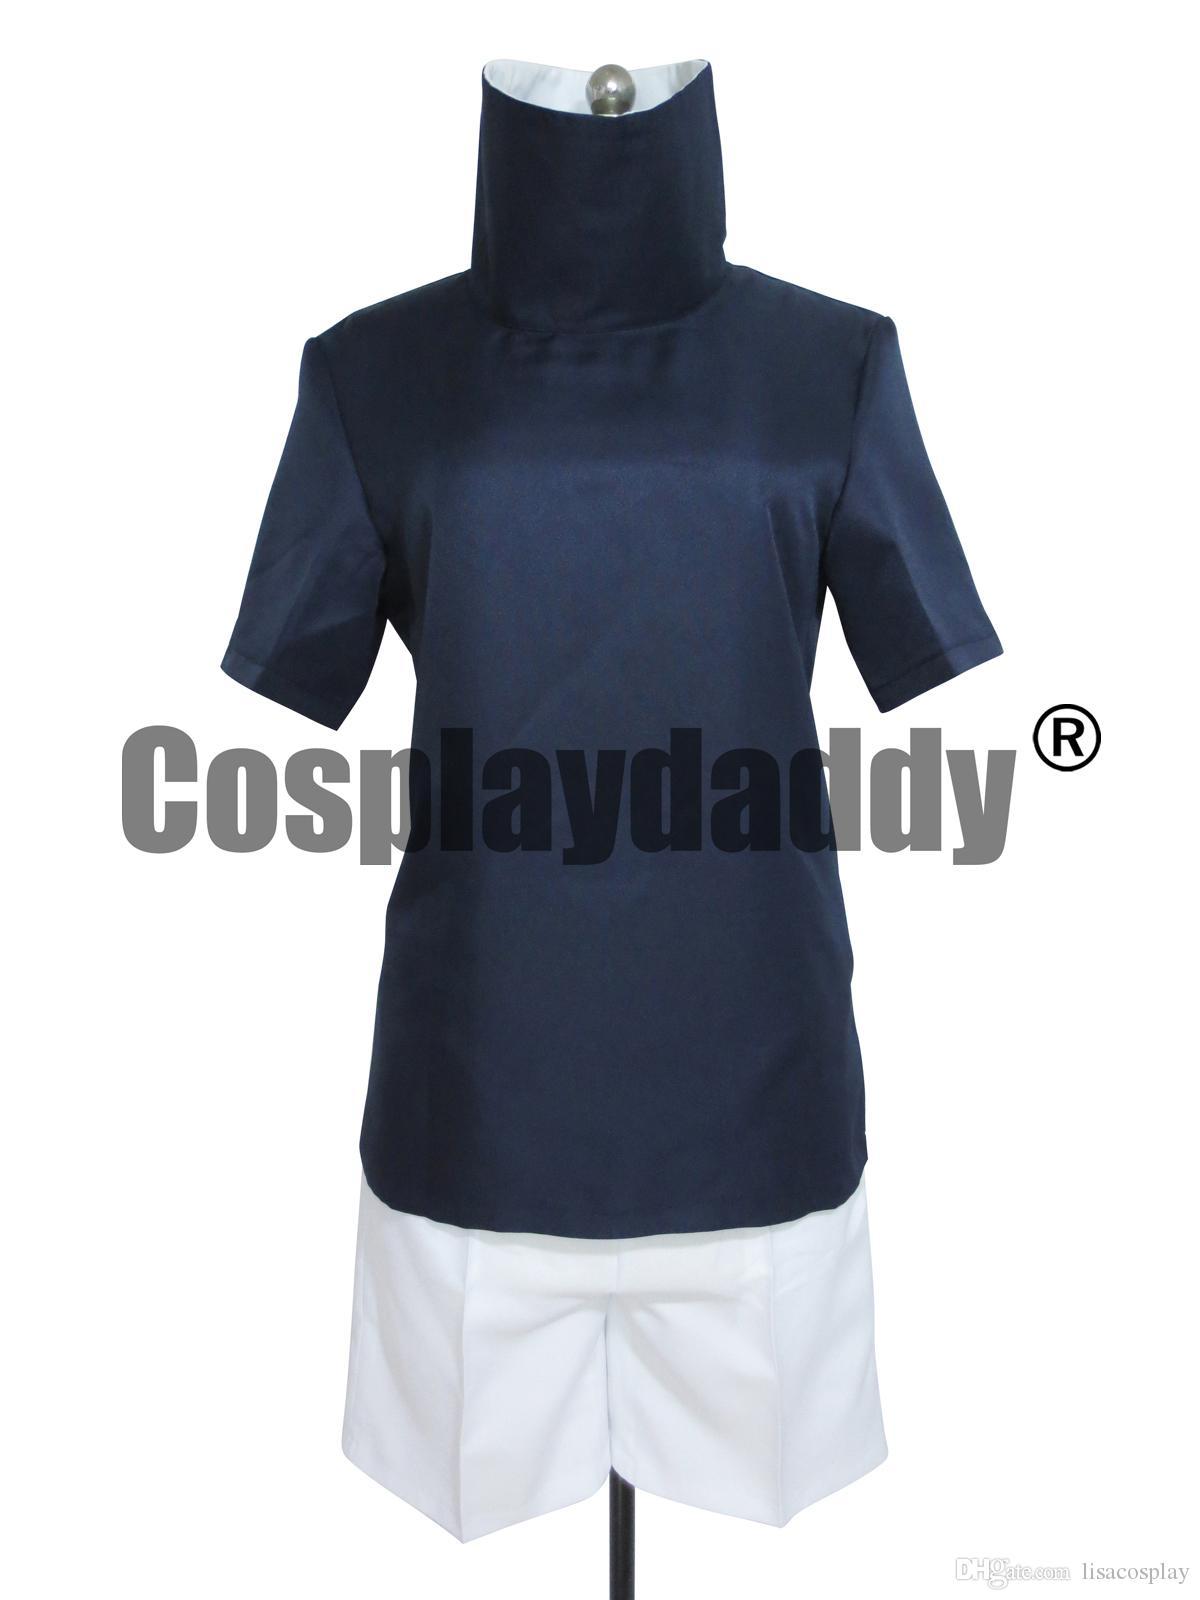 Naruto Sasuke Uchiha Cosplay Costume Anime Maid Costume Squall Cosplay From Lisacosplay 5584 Dhgatecom